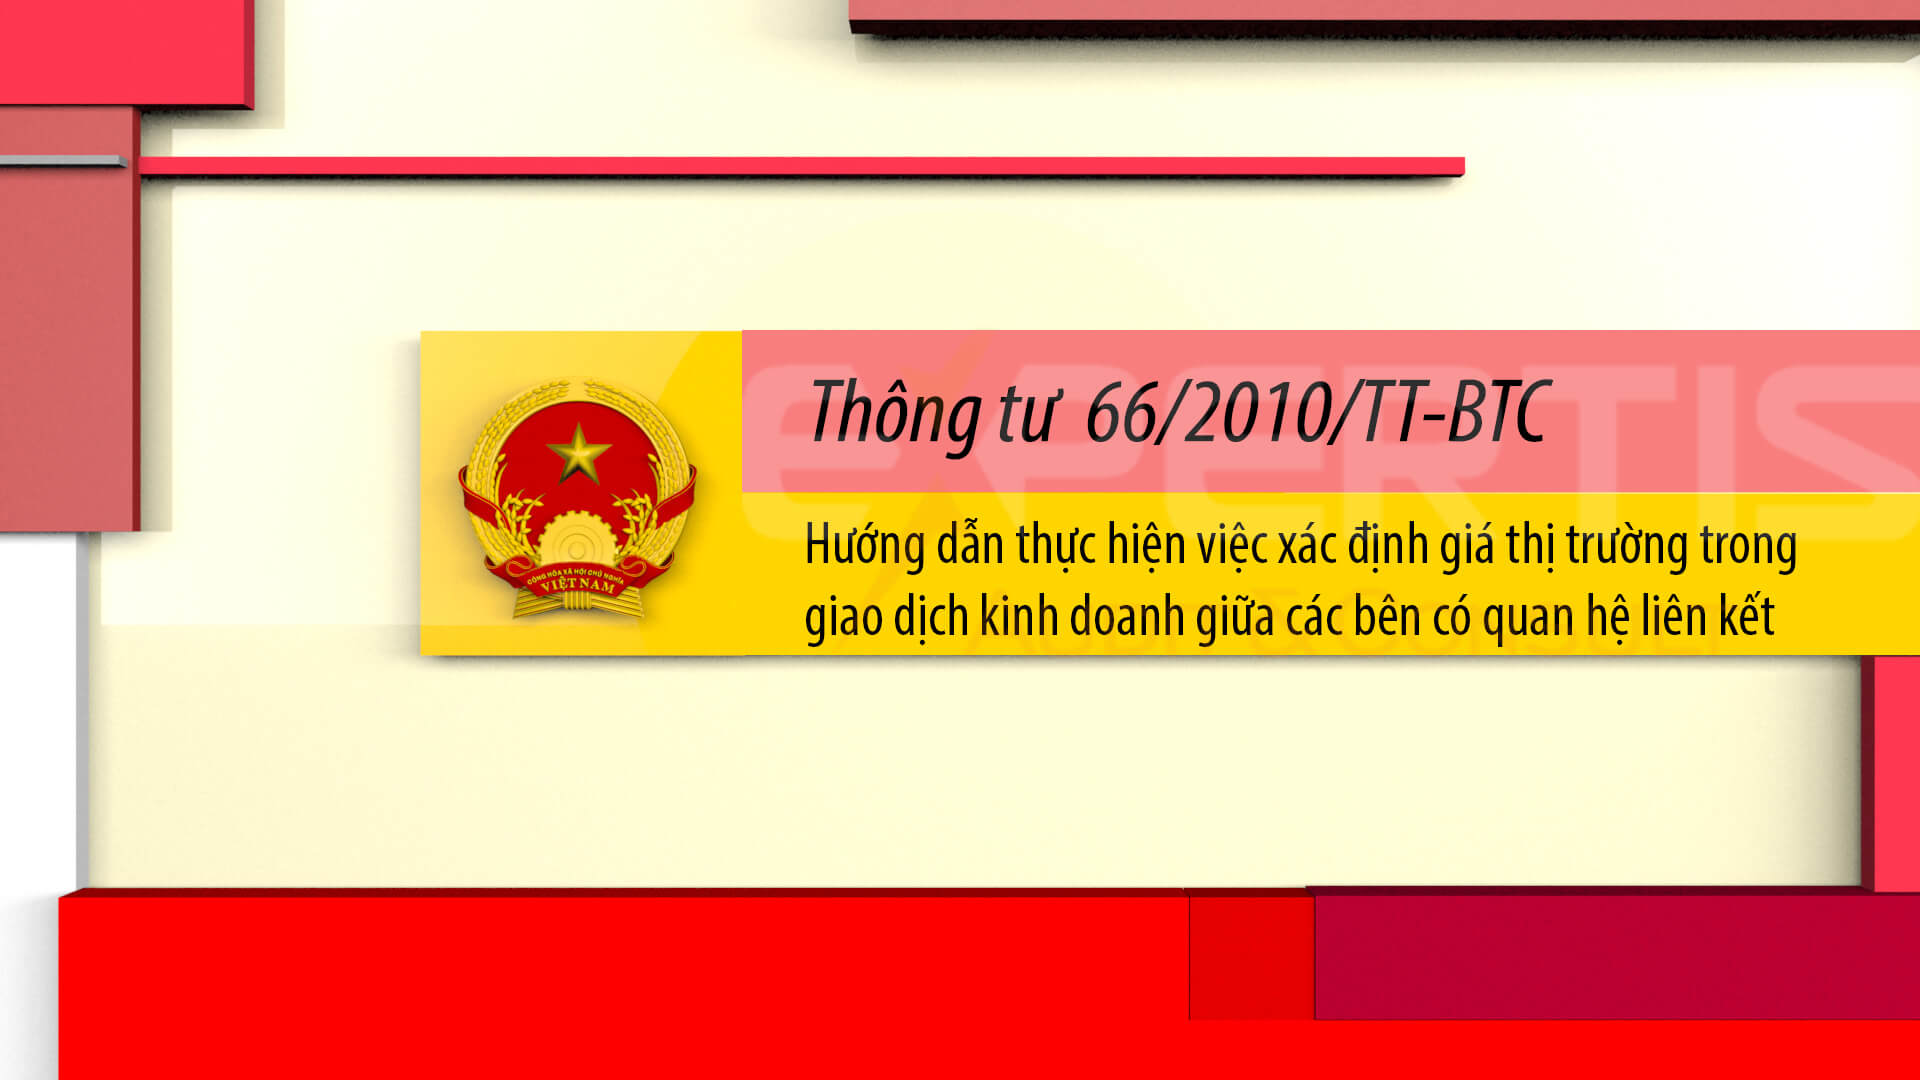 Thông tư 66/2010/TT-BTC